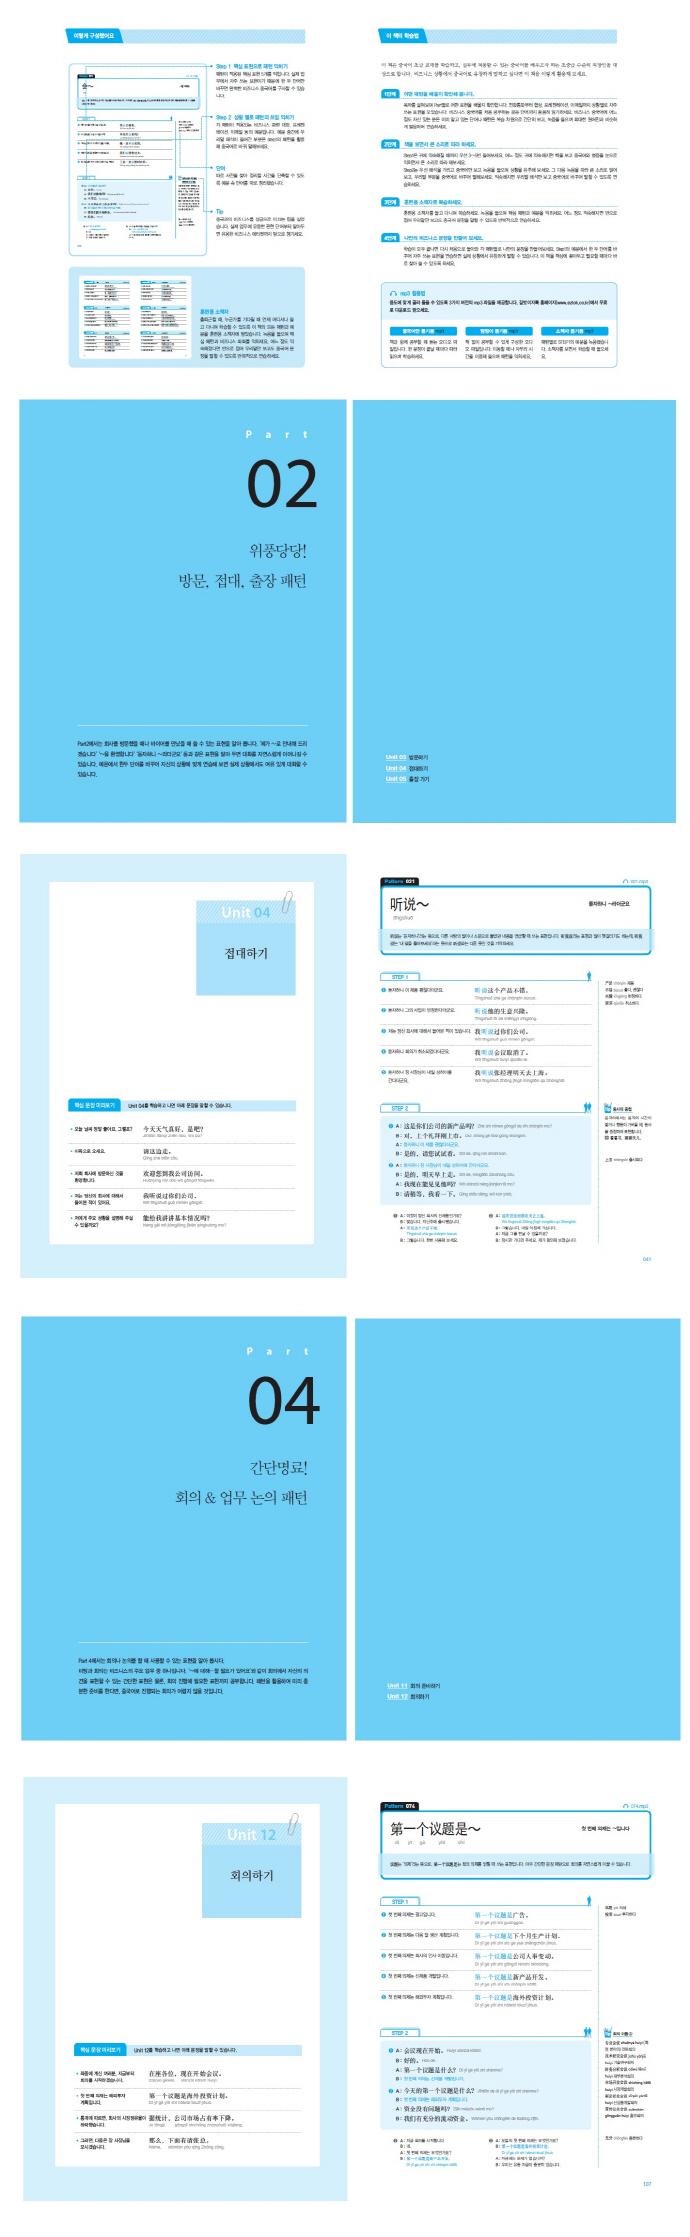 [ePub3.0] 비즈니스 중국어회화&이메일 핵심패턴 233 도서 상세이미지